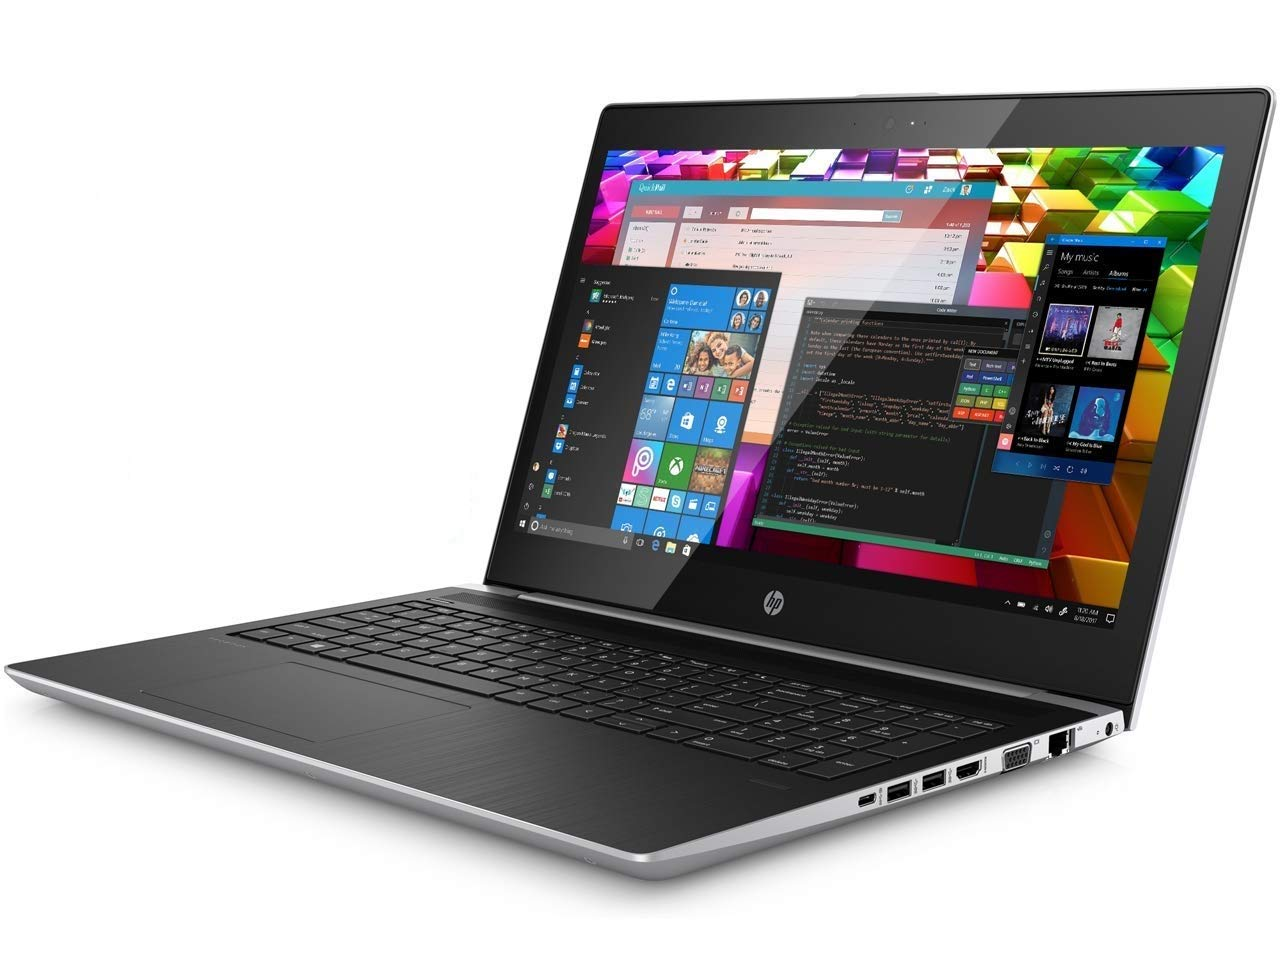 "HP Hp probook 450 g5 15.6"" Anti-Glare hd Business Laptop (Intel Quad core i5-8250u, 16gb ddr4 ram, 512gb pcie nvme m.2 ssd, uhd 620) Type-c, WiFi ac, Webcam, hdmi, vga, Windows 10 Home, 2.6 Pound"